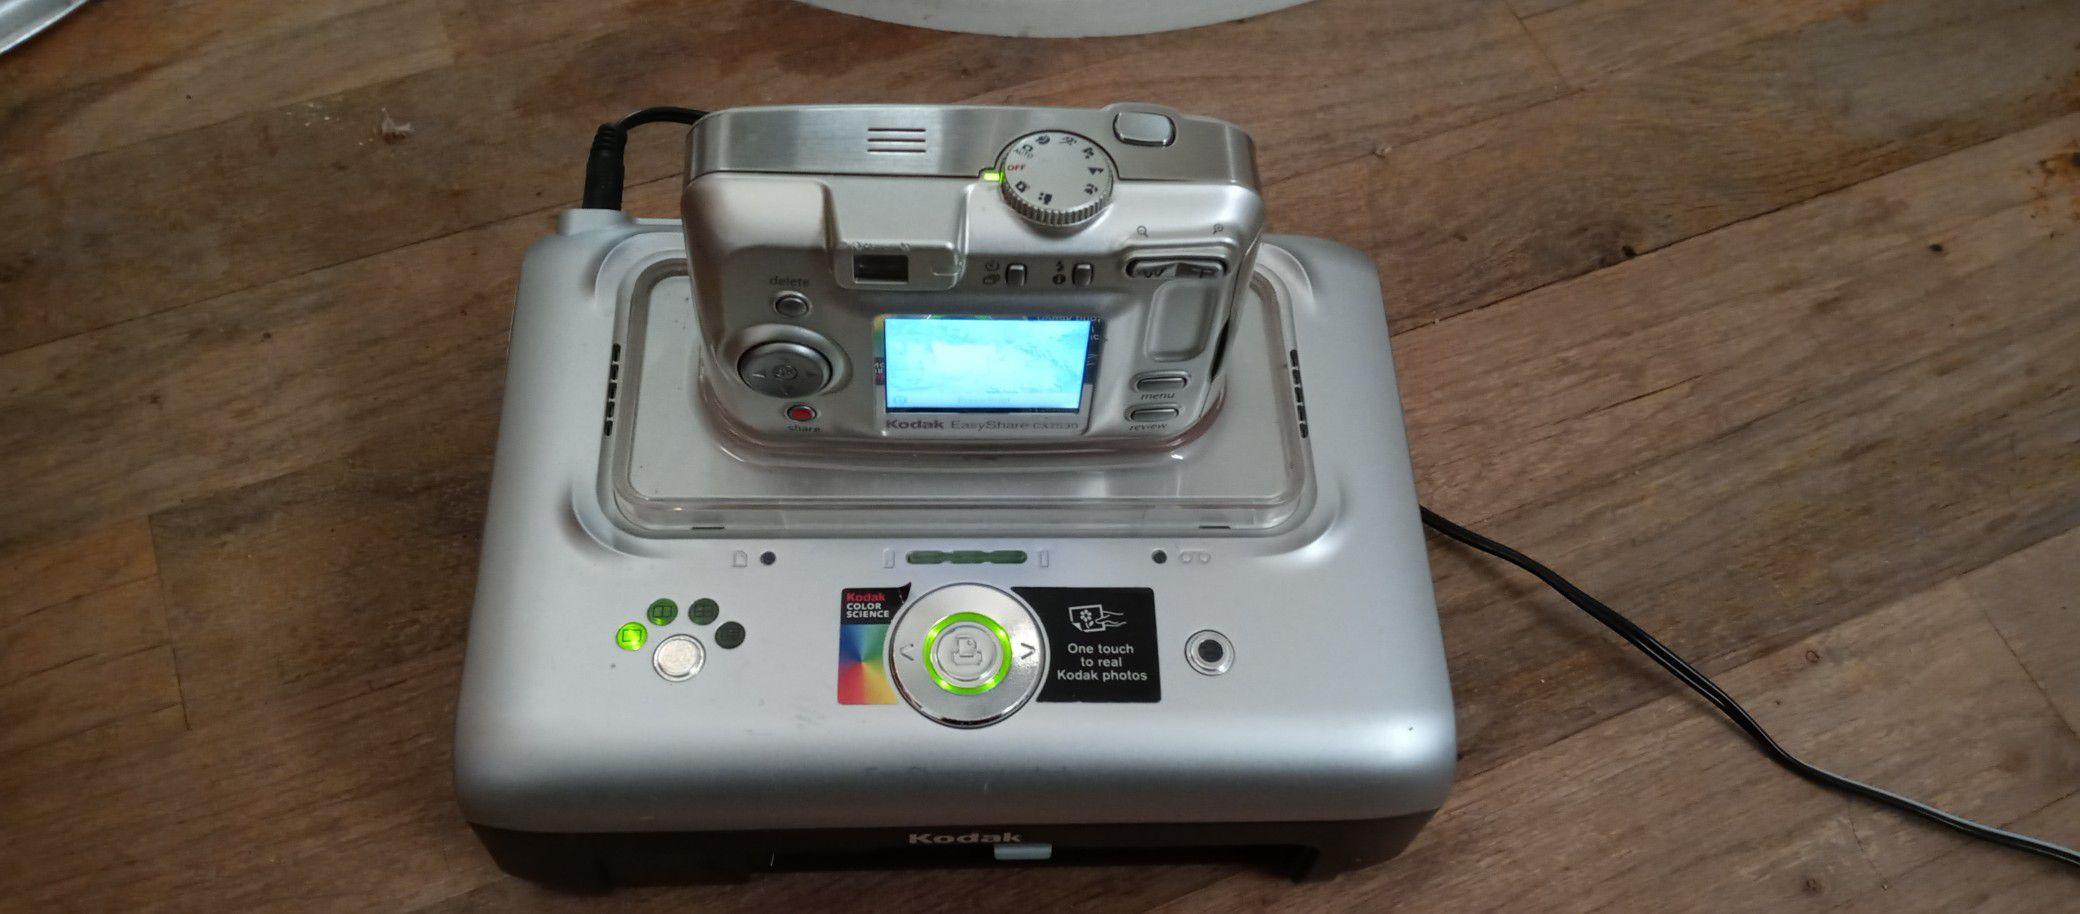 Kodak easy share digital camera and printing dock